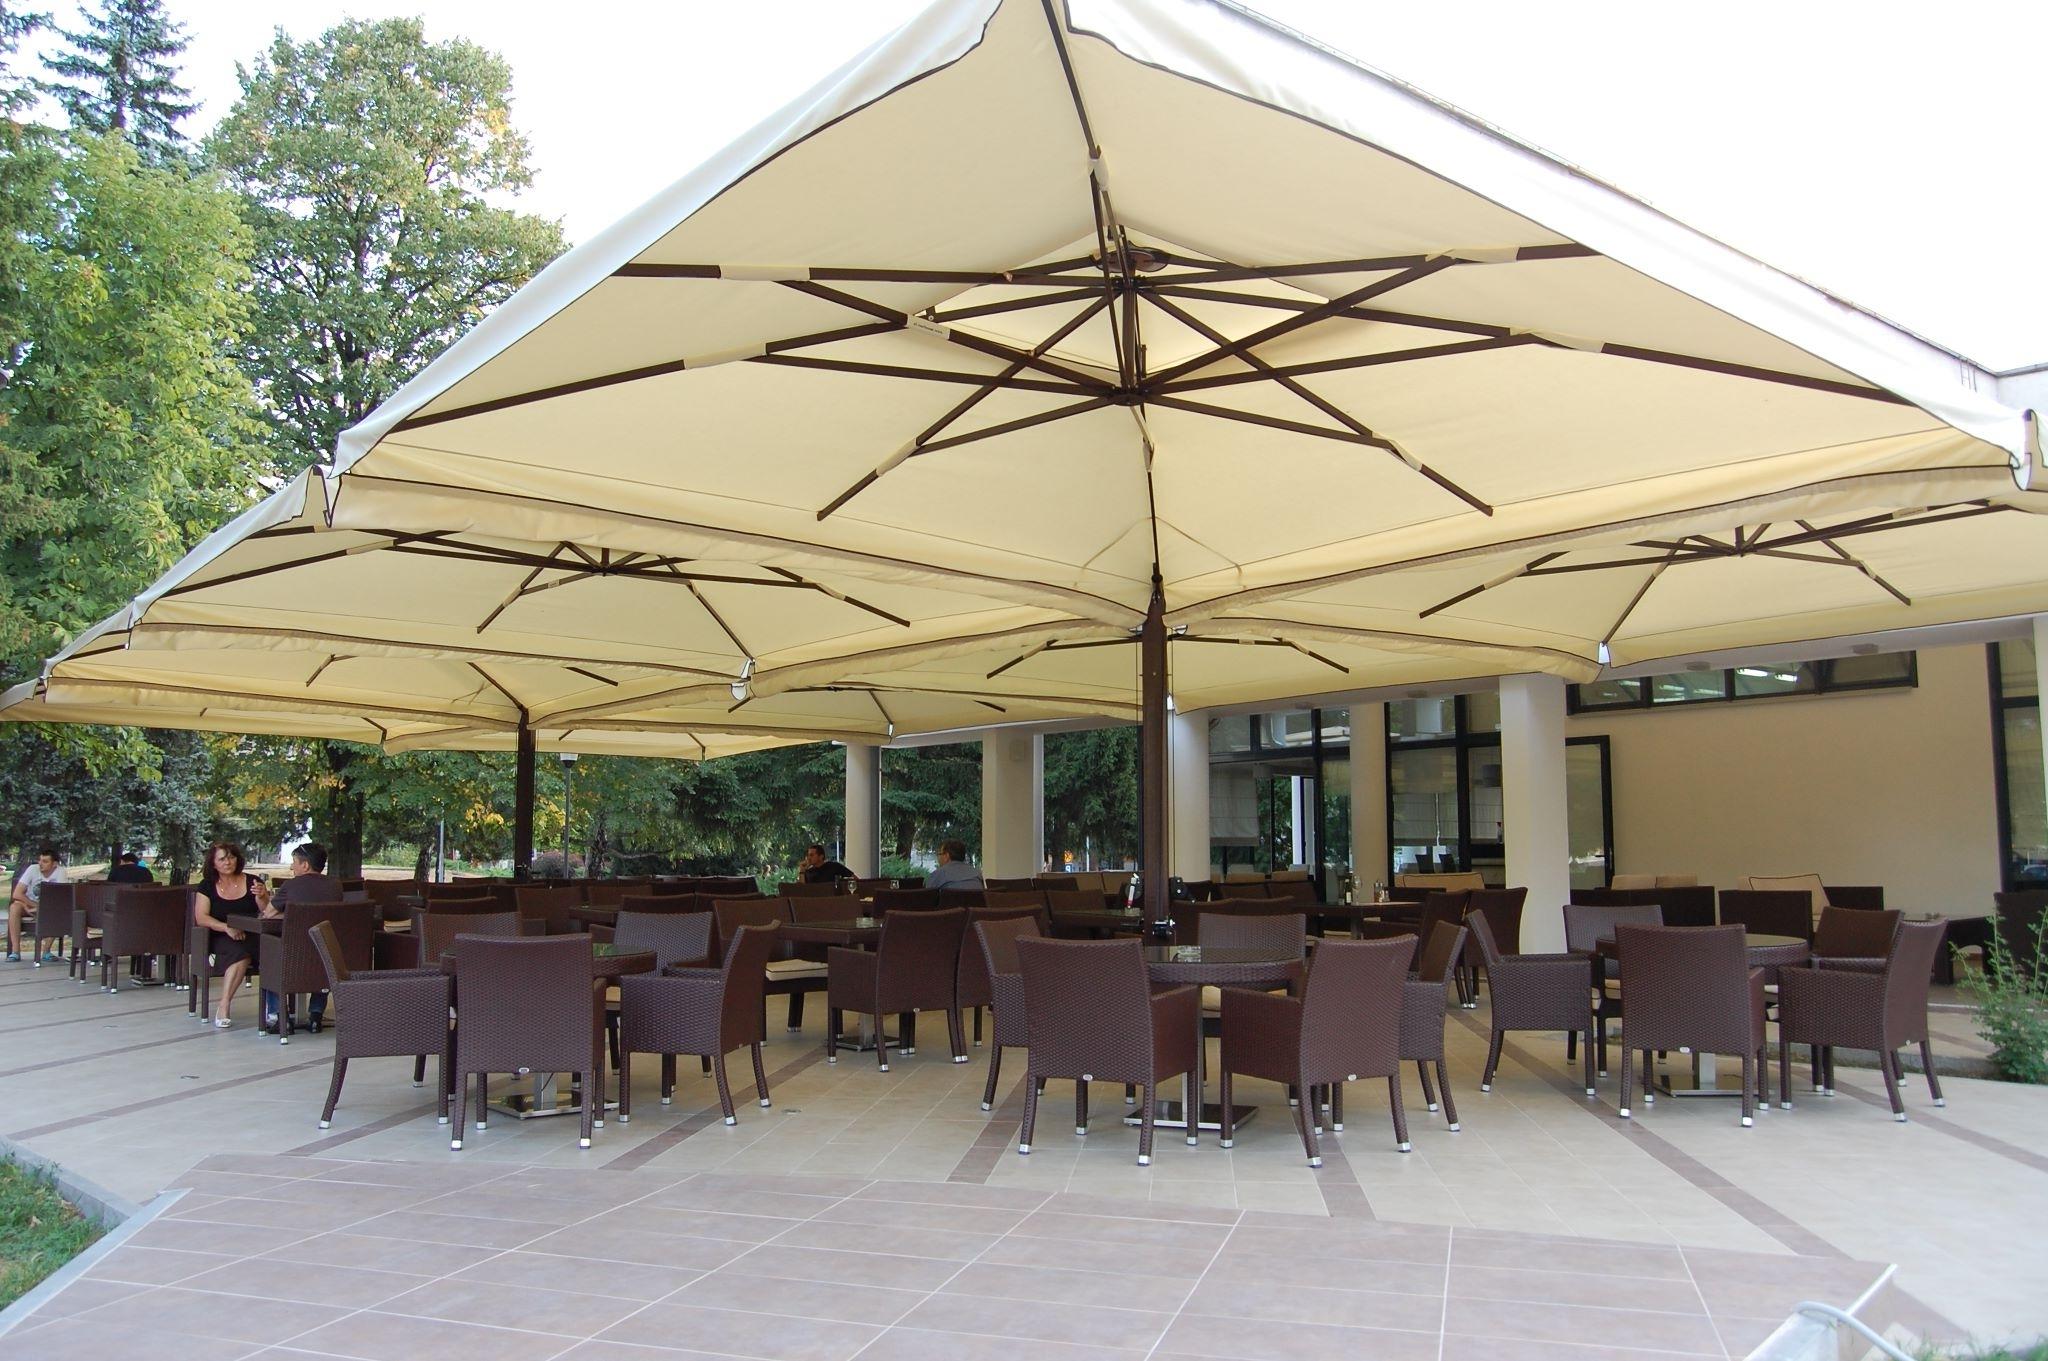 Commercial Patio Umbrellas For Restaurants, Resorts & Events With Regard To Preferred European Patio Umbrellas (View 4 of 20)